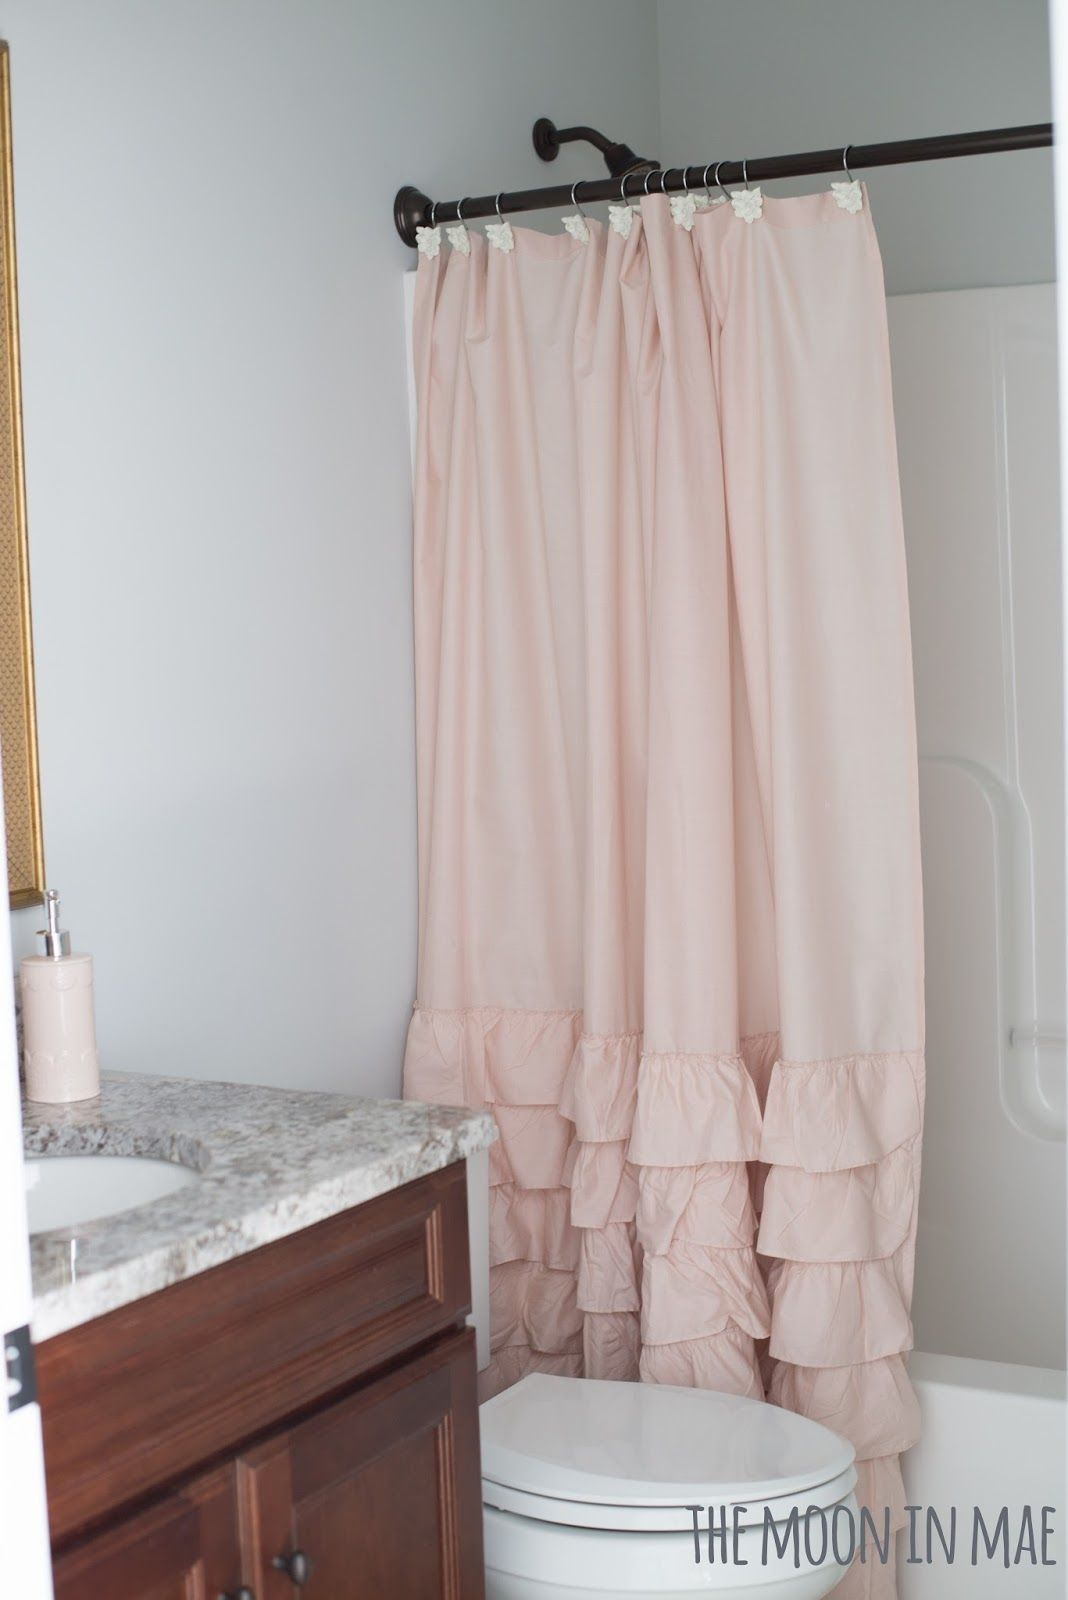 lauren conrad bathroom. studio bath reveal  blush ruffled shower curtain LC Lauren Conrad Blush and gold